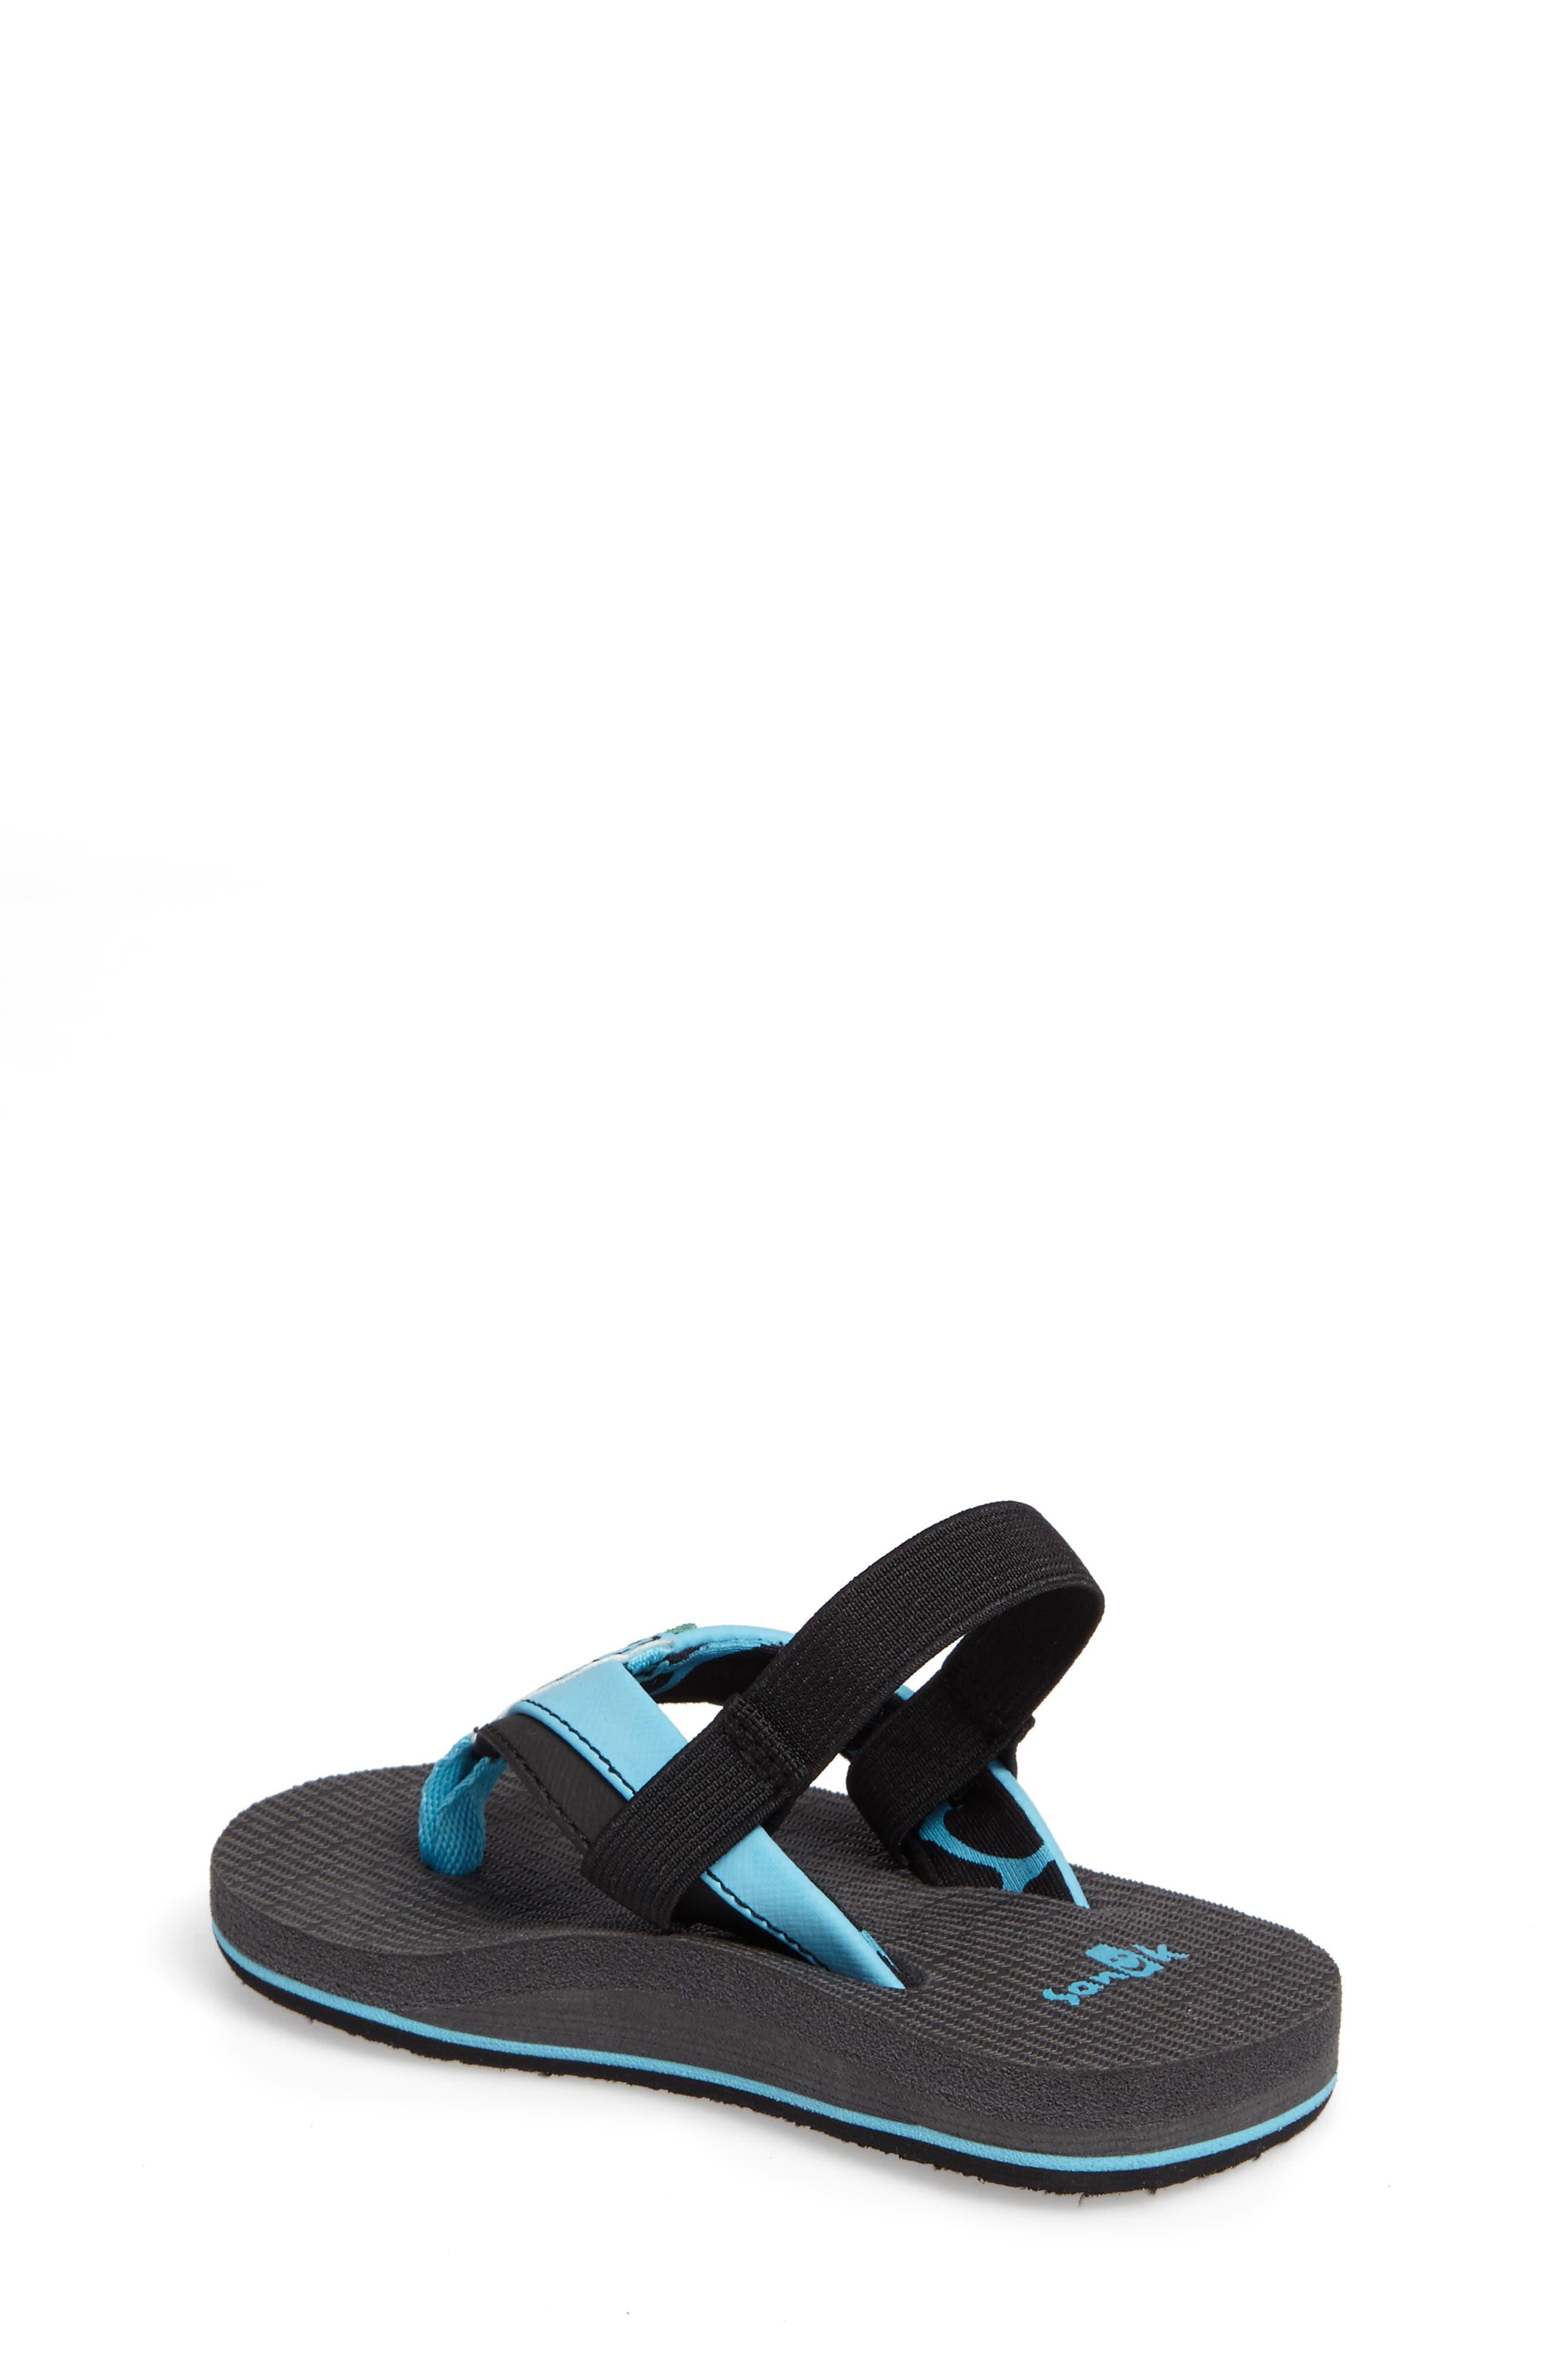 'Rootbeer Cozy' Lightweight Flip Flop Sandal,                             Alternate thumbnail 10, color,